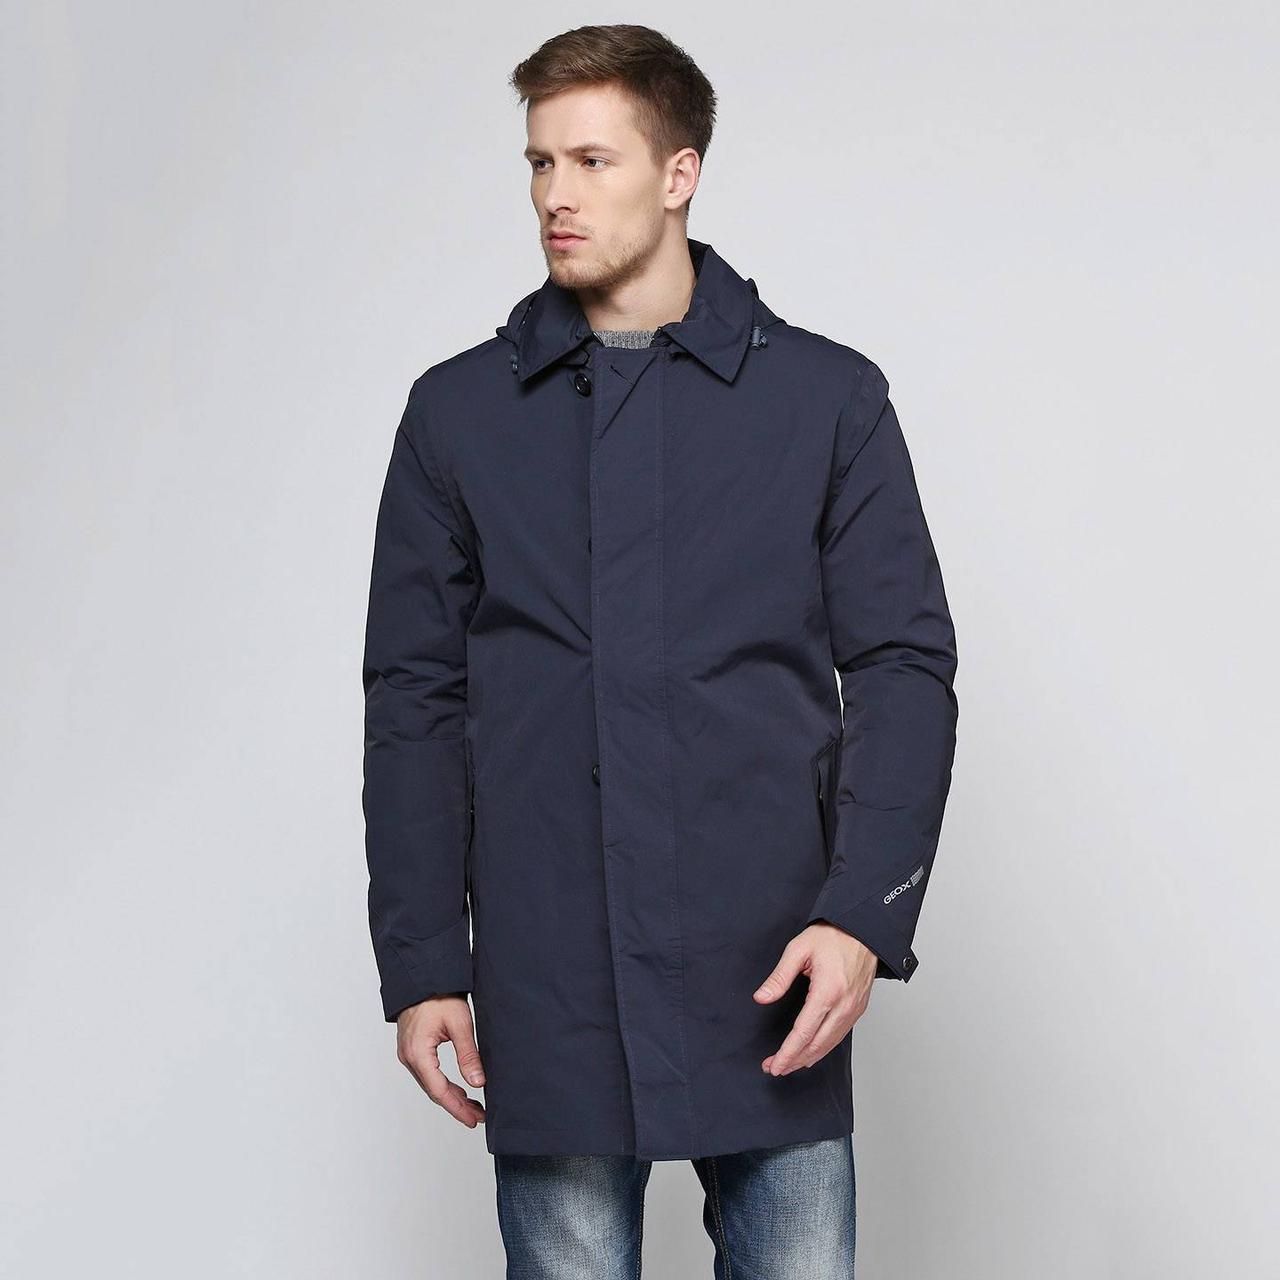 4aab0cae8c61 Куртка мужская Geox M3221C 48 Синий M3221CBL-48, КОД  305258 - Интернет-